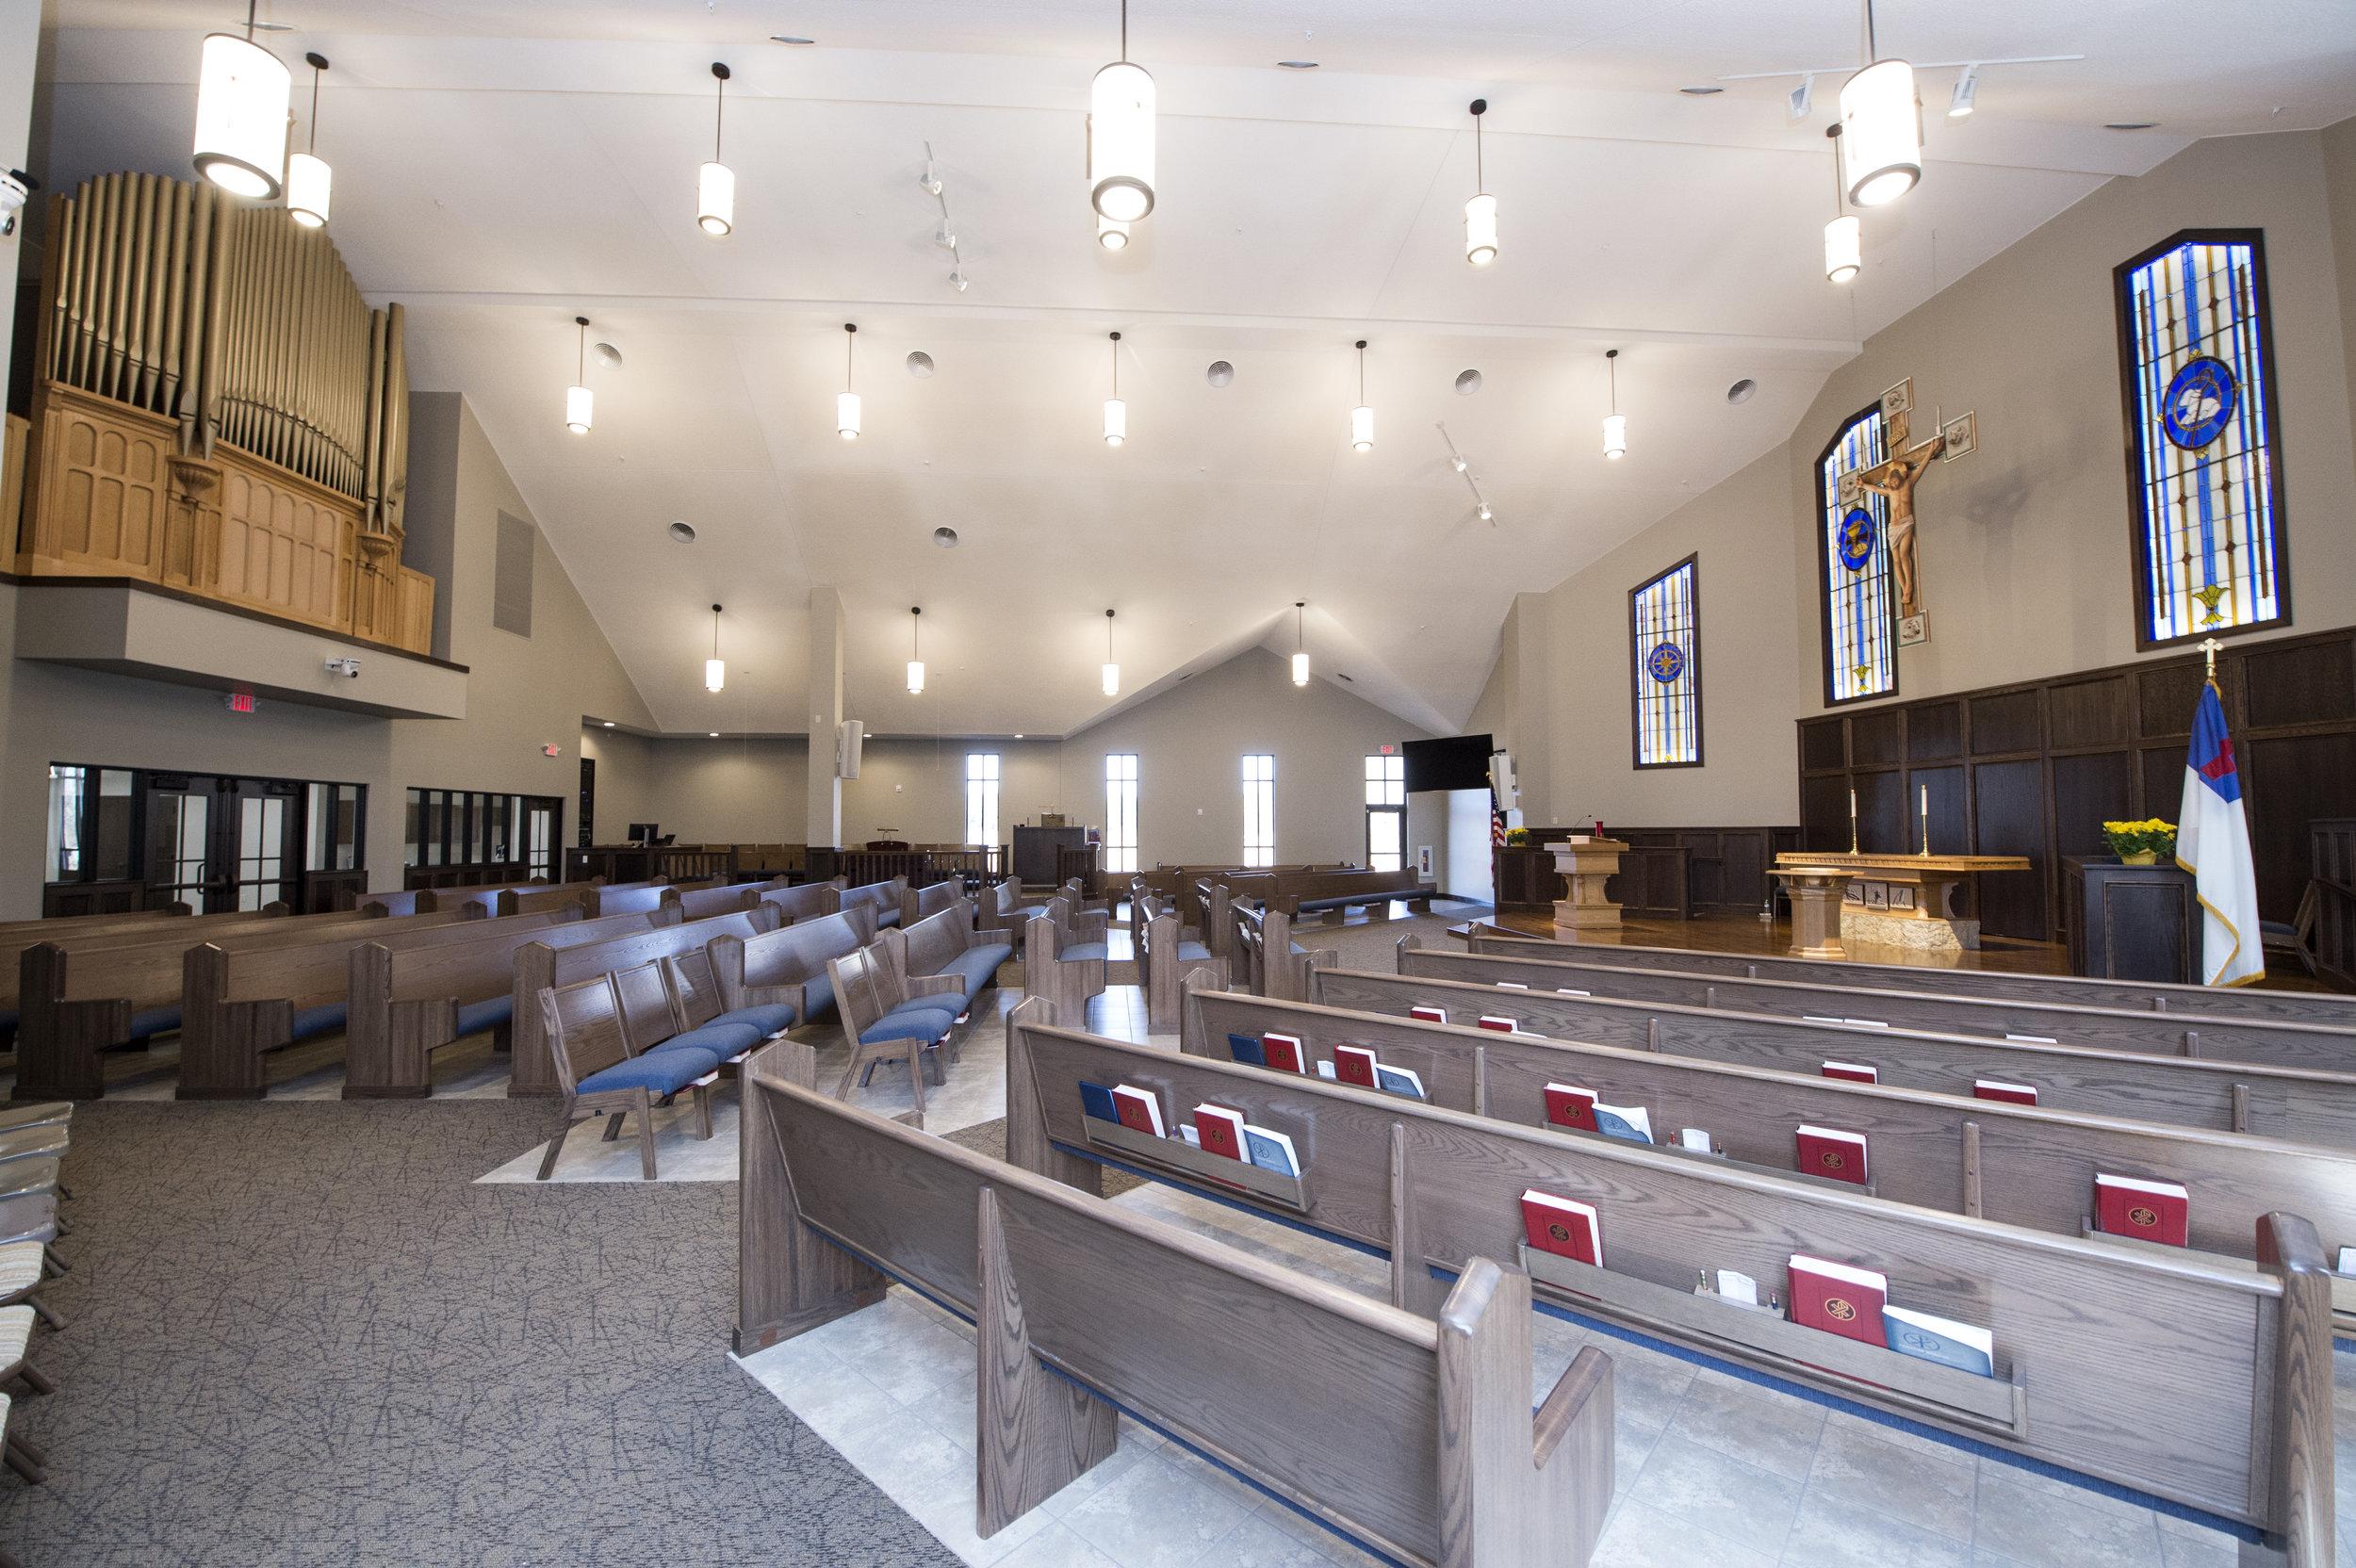 Bethlehem Lutheran Church View of the Sanctuary